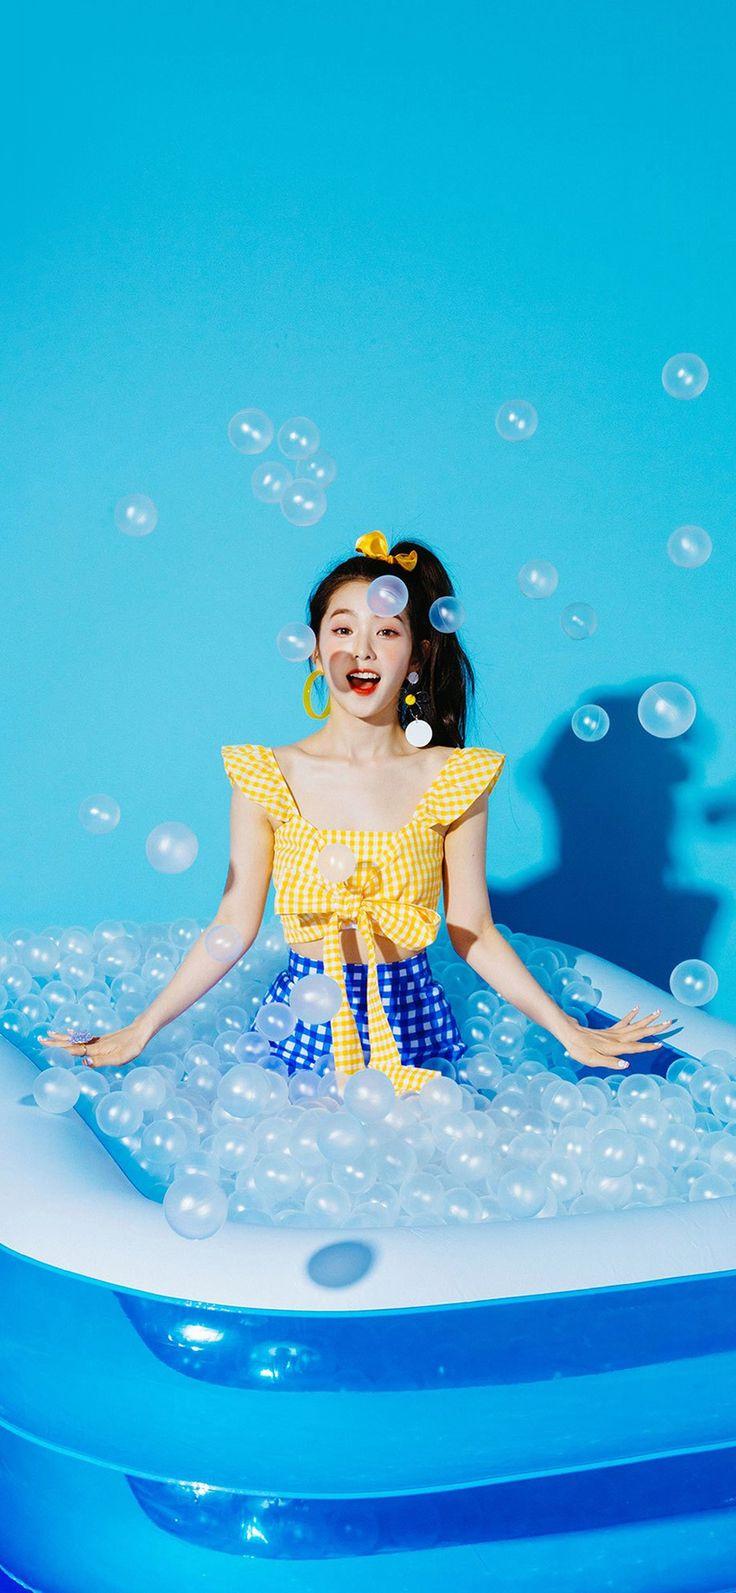 Iphone X Wallpaper Hr03 Blue Girl Redvelvet Kpop Summer Water Via